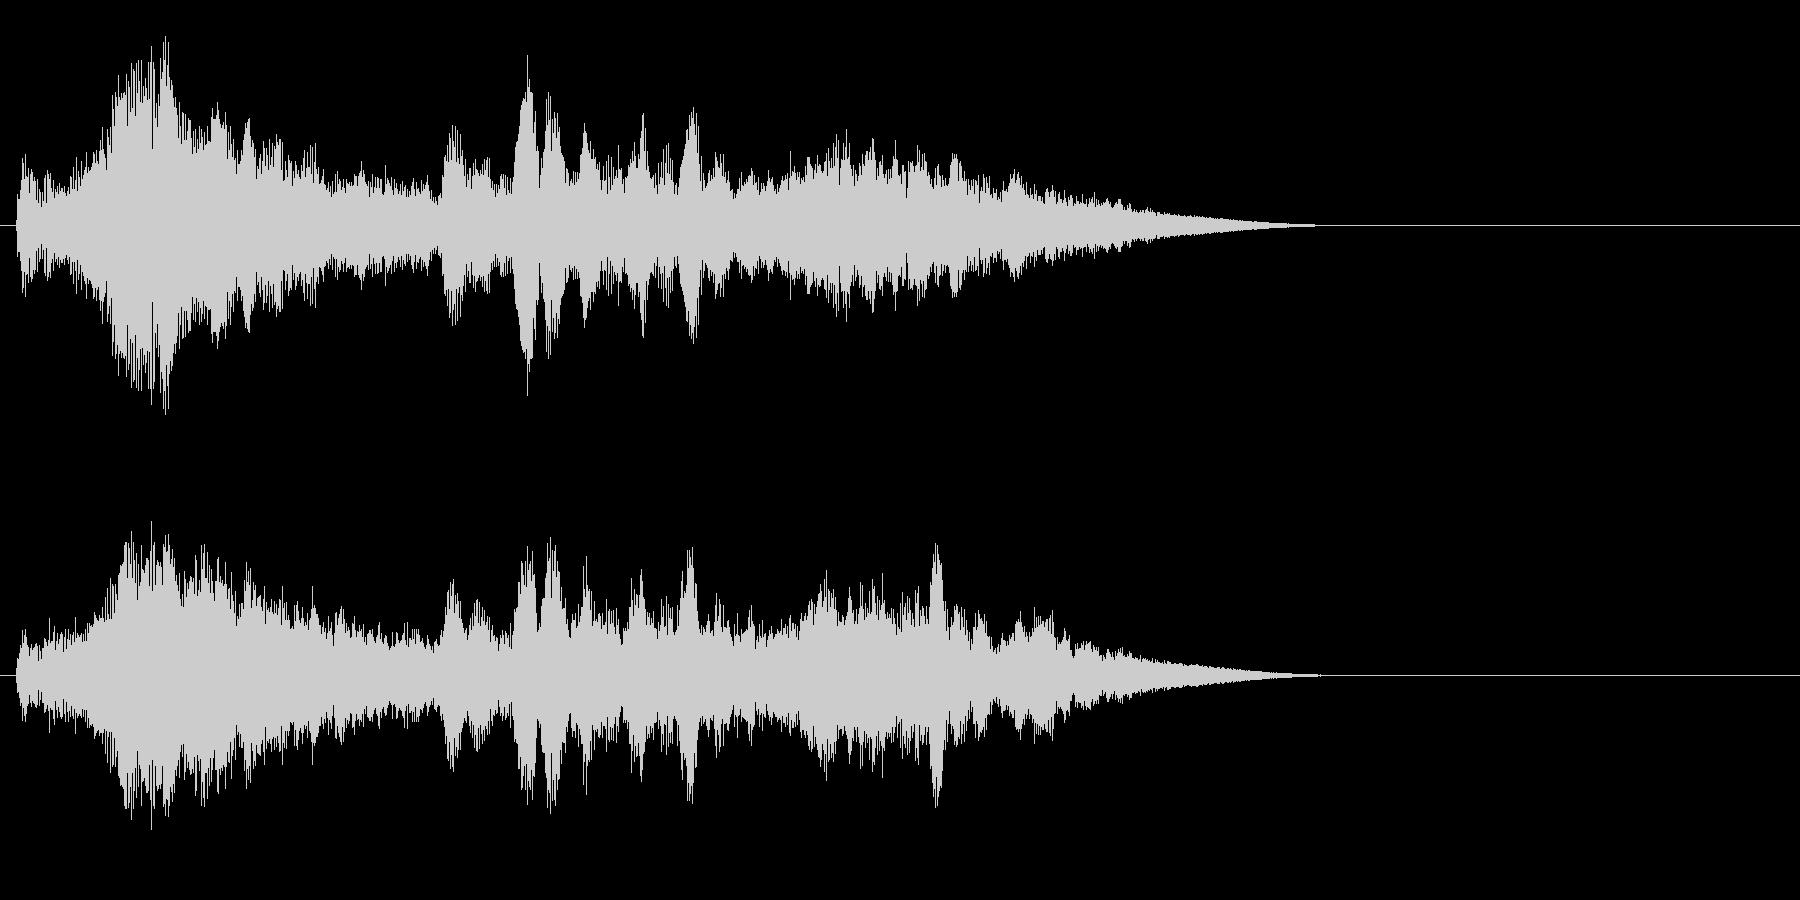 SF 移動音 13の未再生の波形